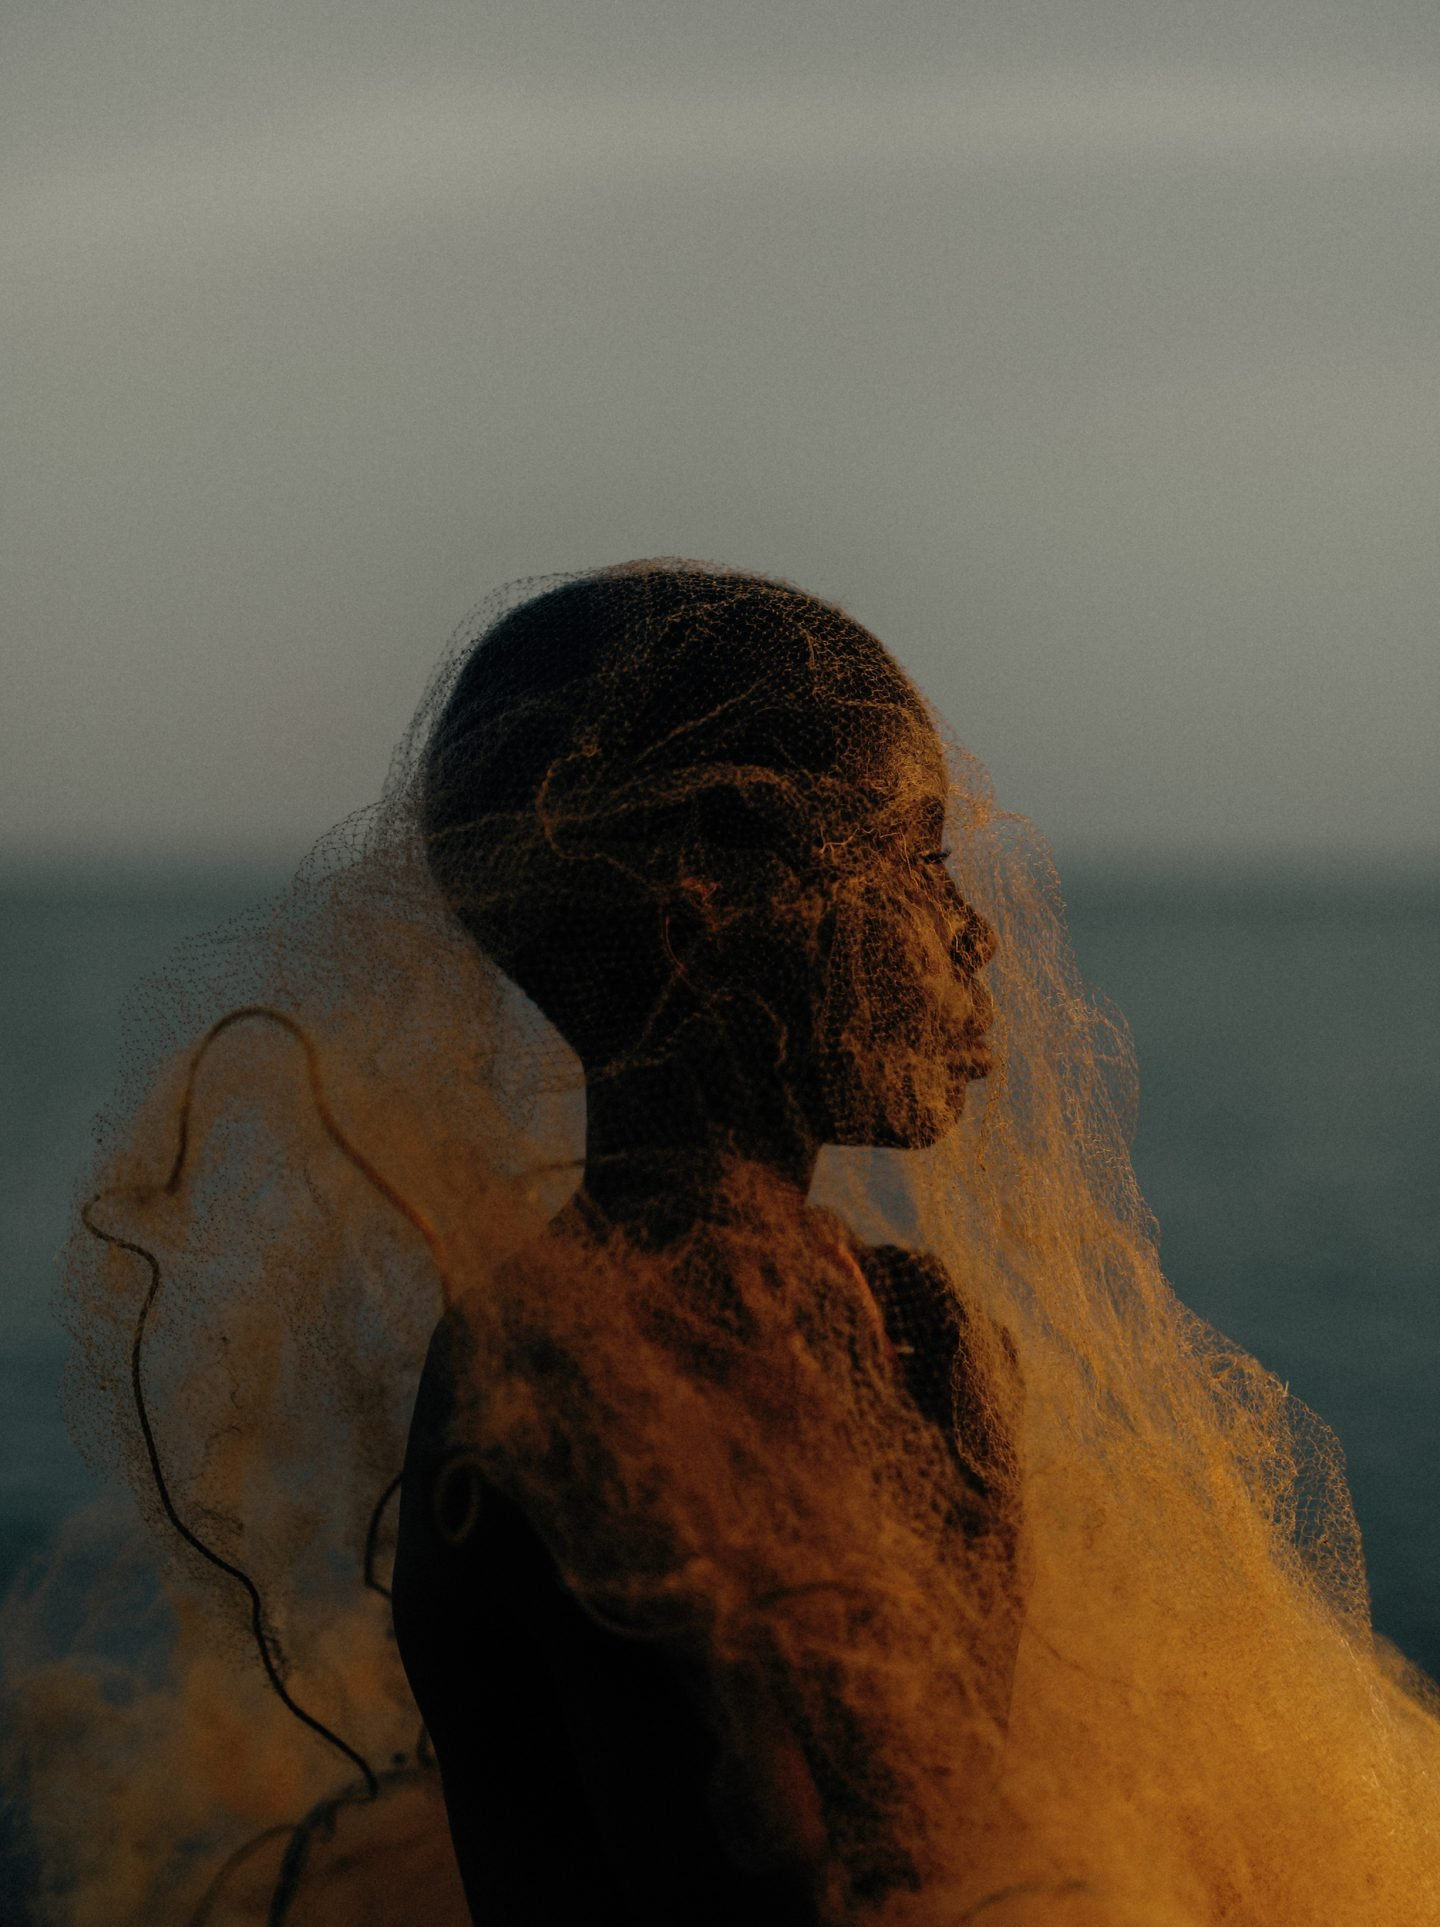 IGNANT-Photography-Jeremy-Snell-Boys-Of-Volta-01